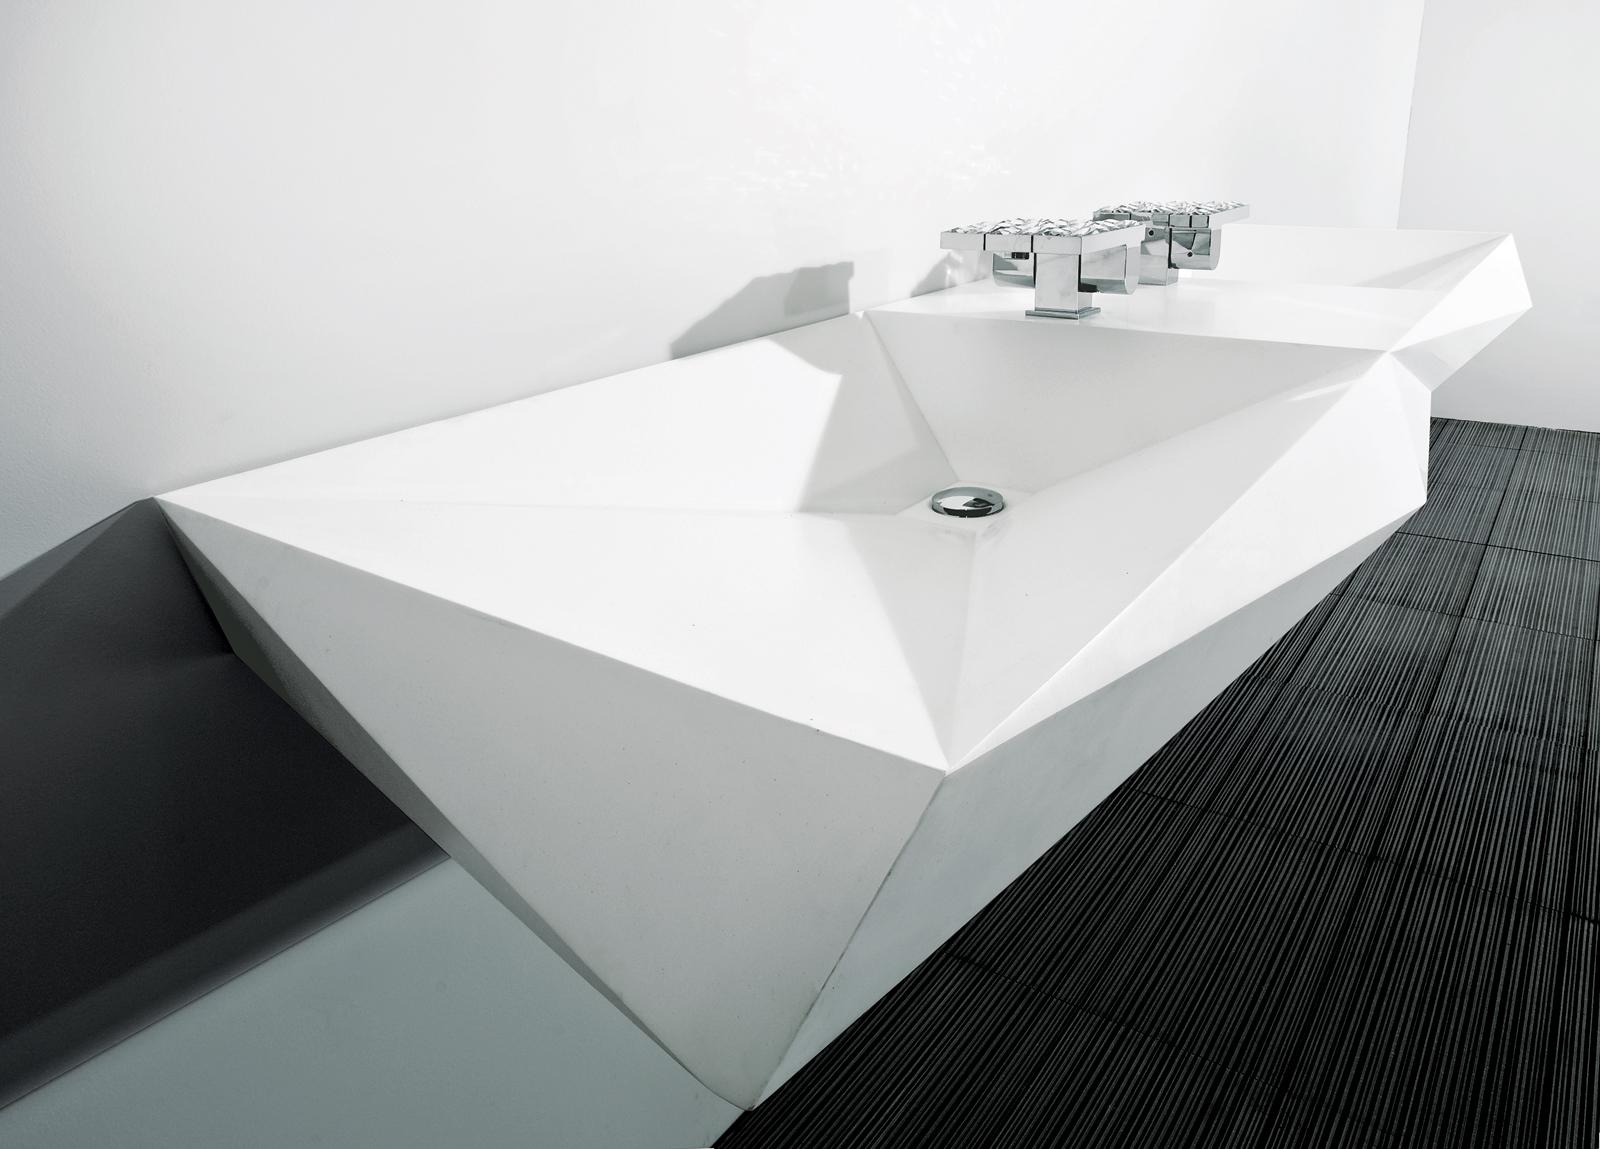 Crystalline Bath Collection by Mojgan and Gisue Hariri